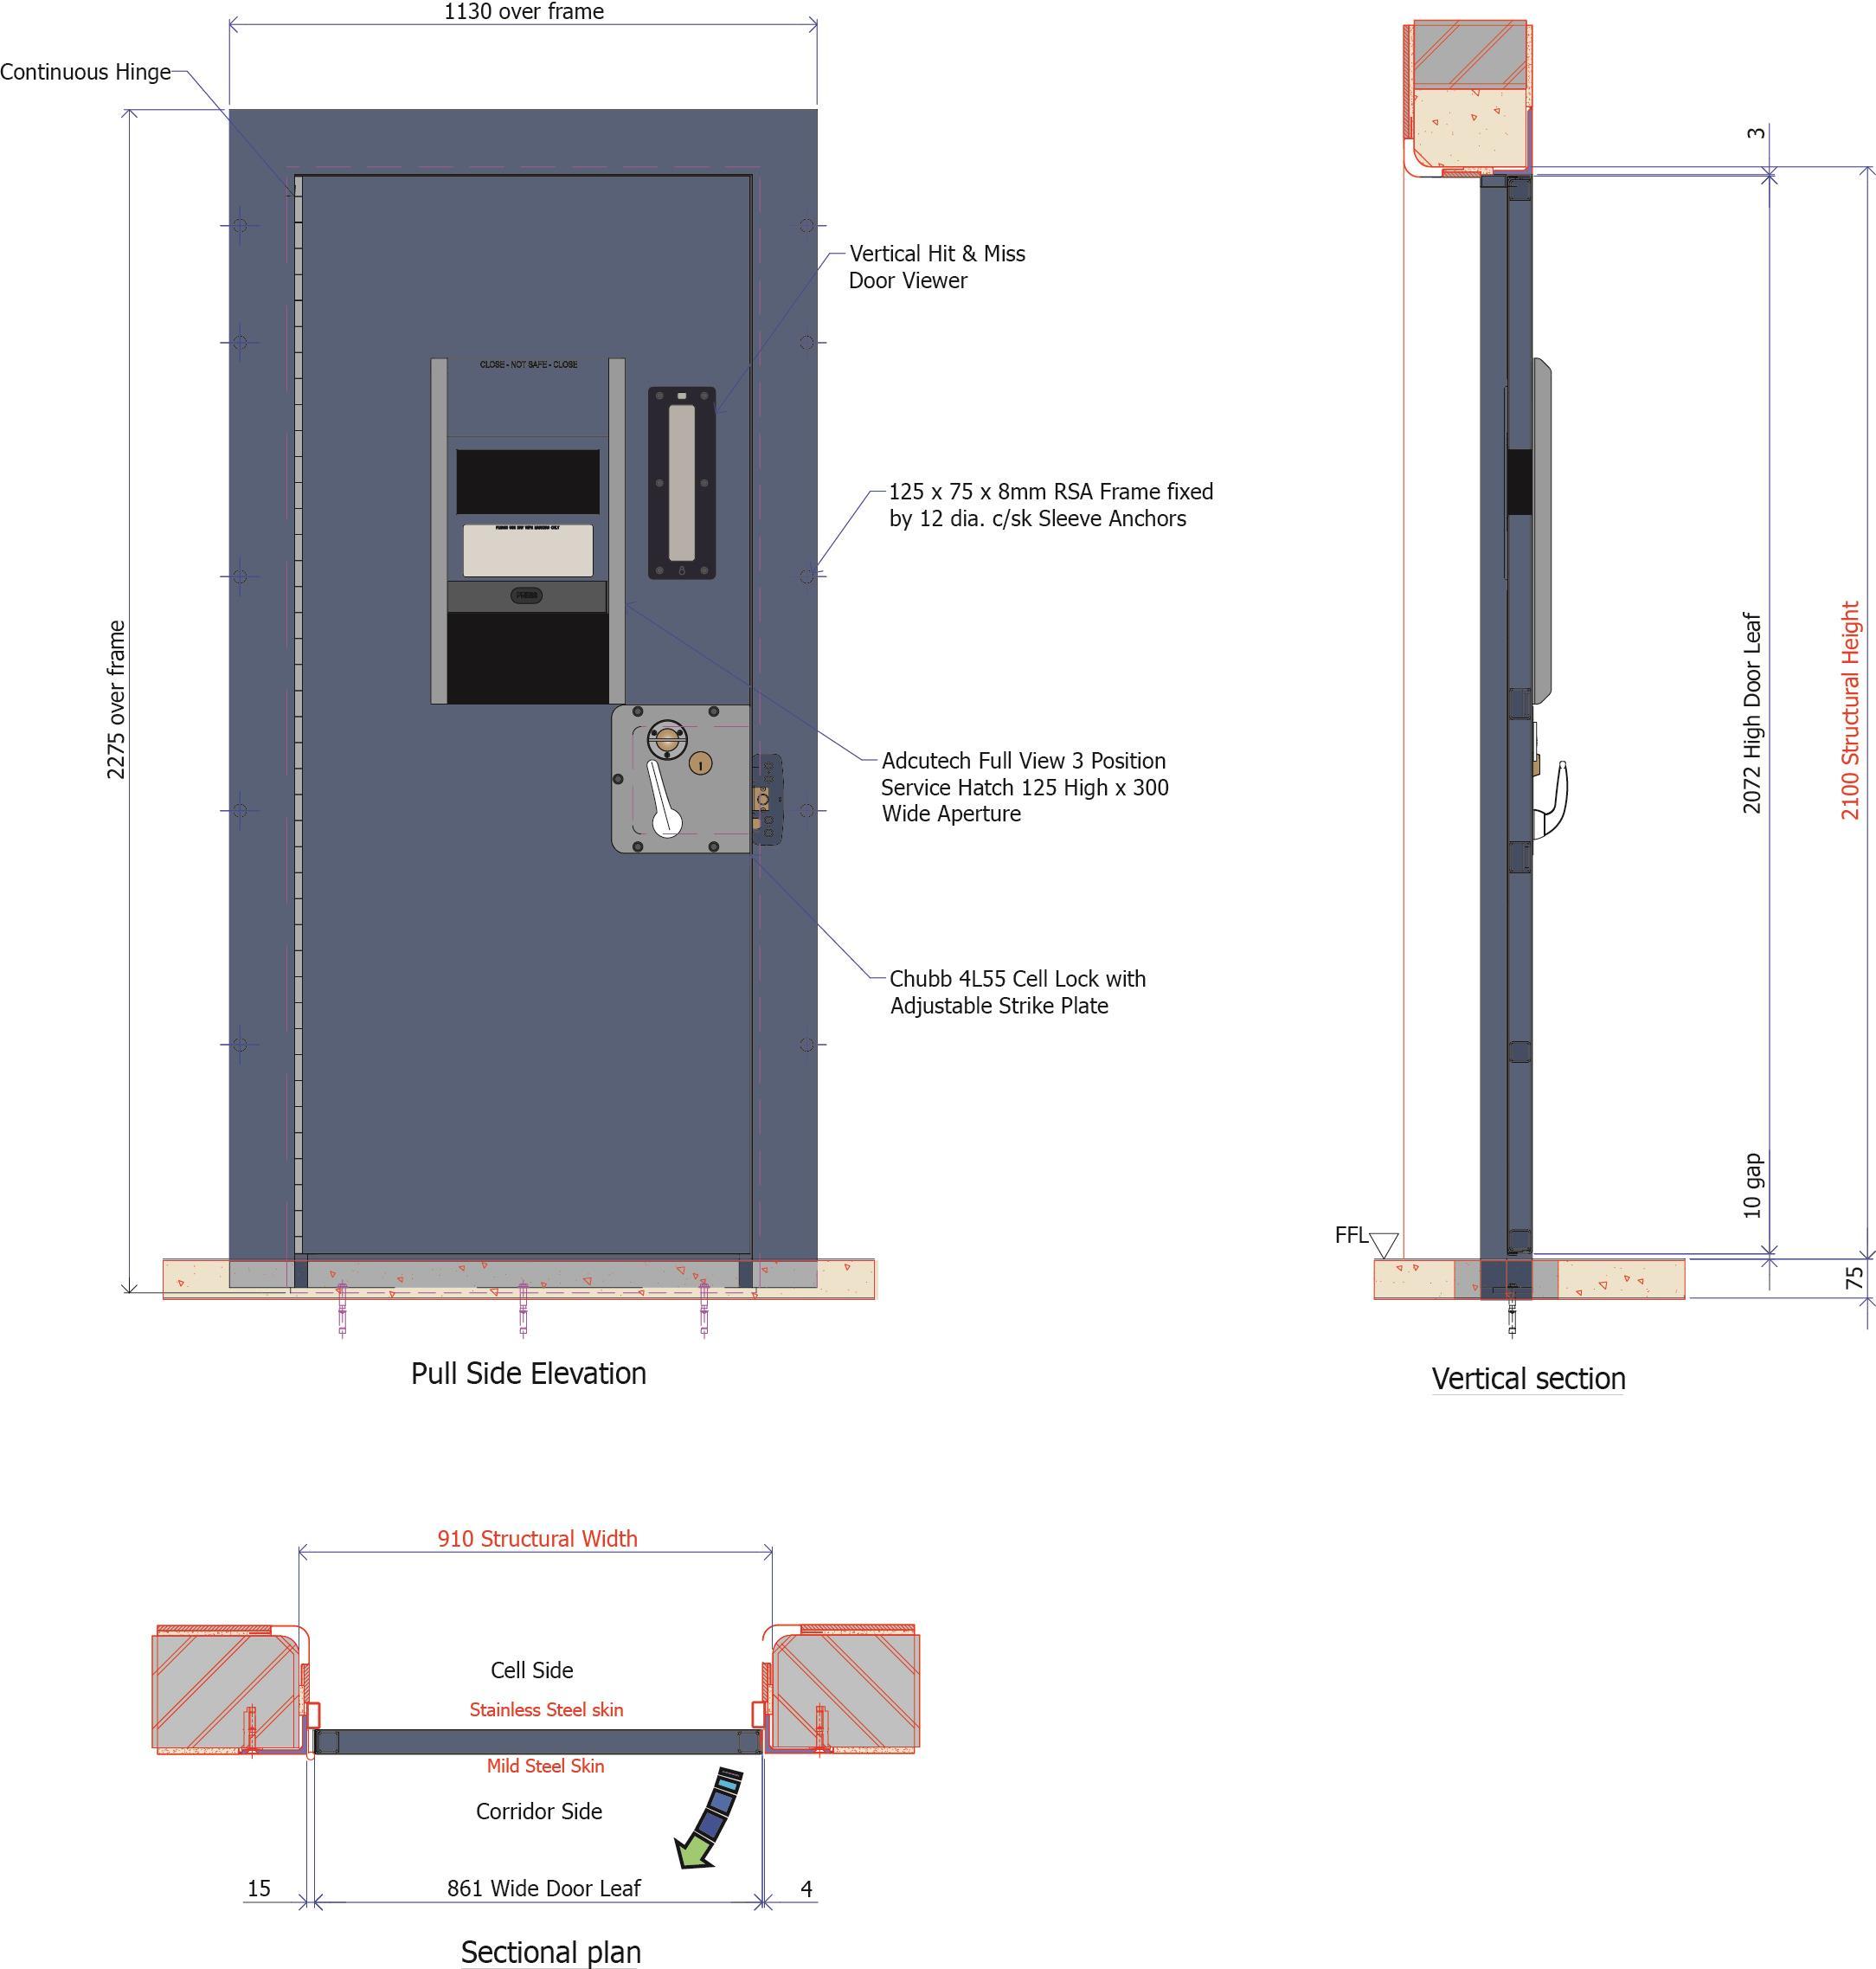 Custodial doors, gates, grilles & windows